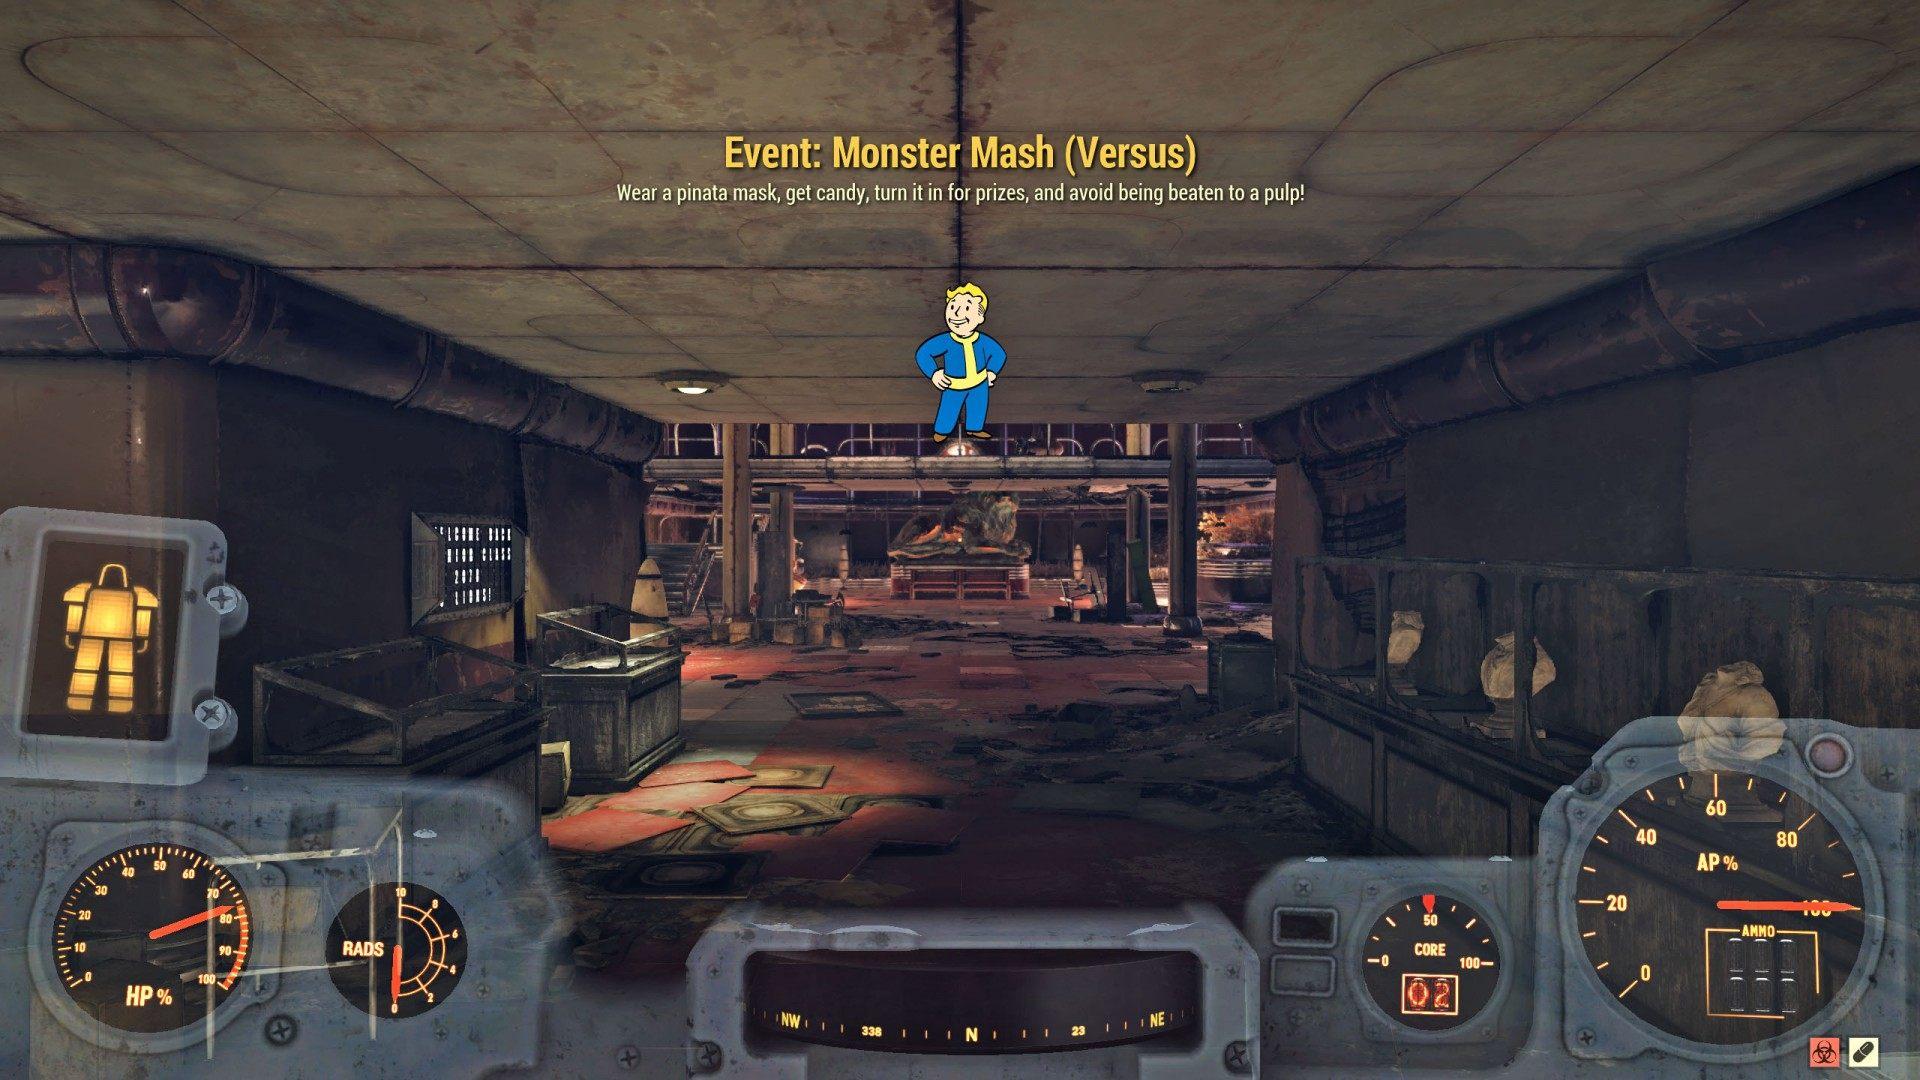 Event: Monster Mash, Fallout 76 Quest